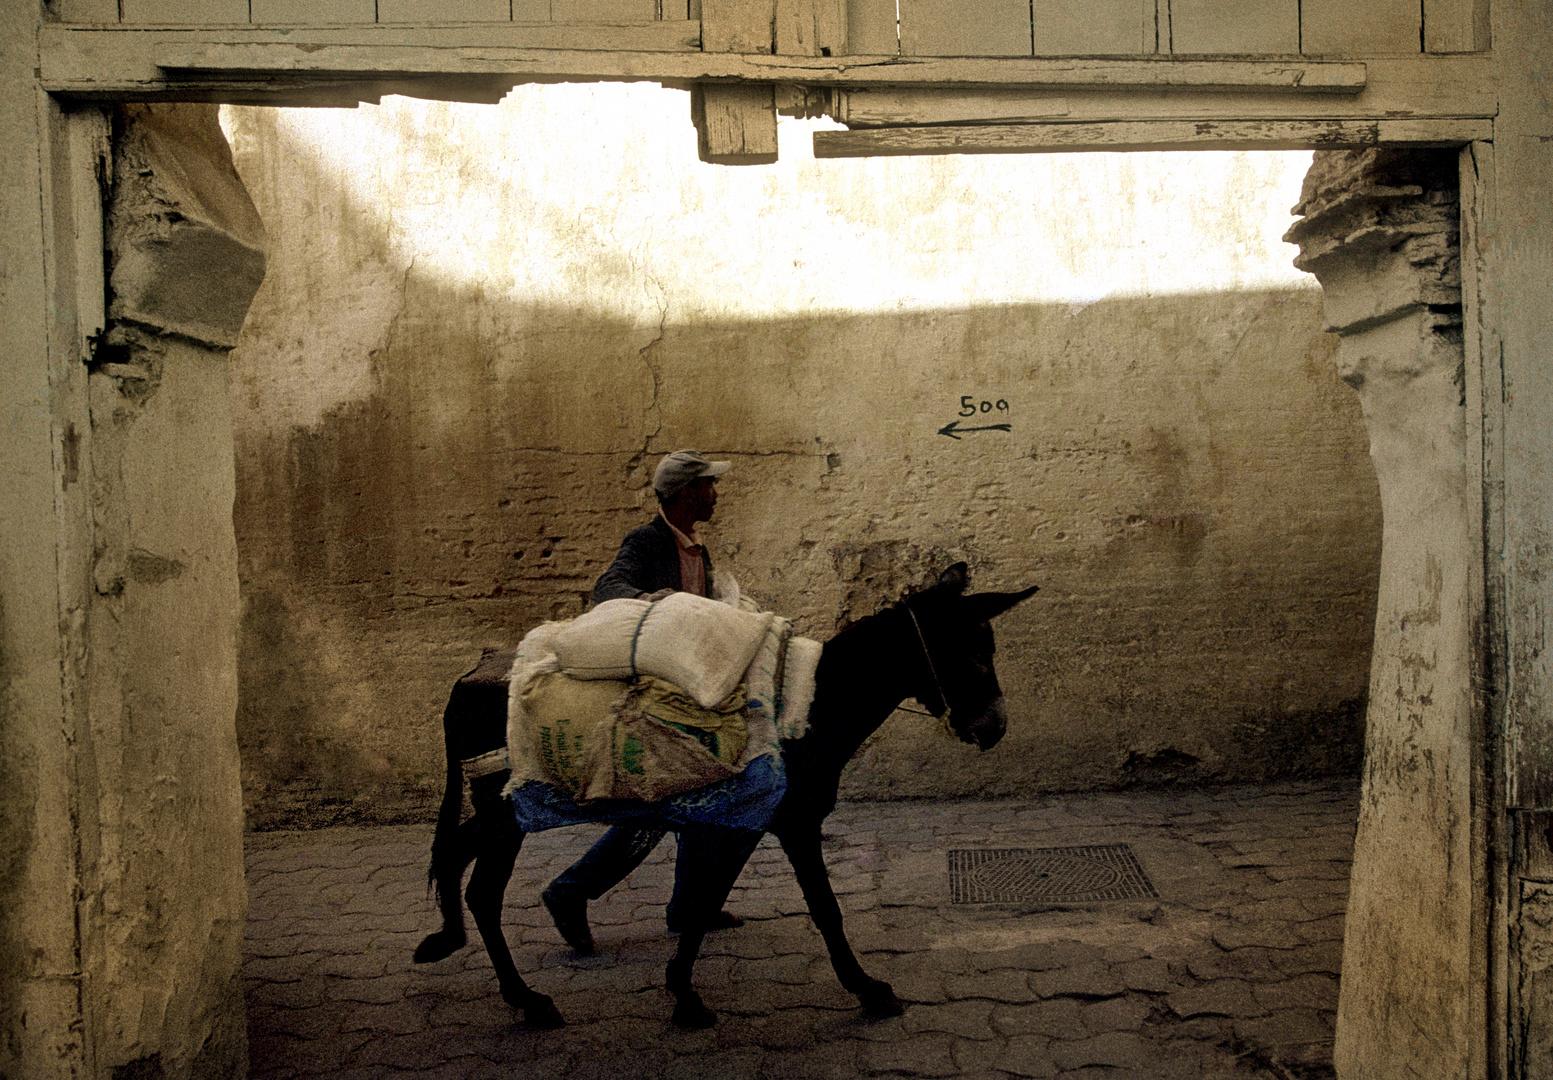 Transport in Meknes